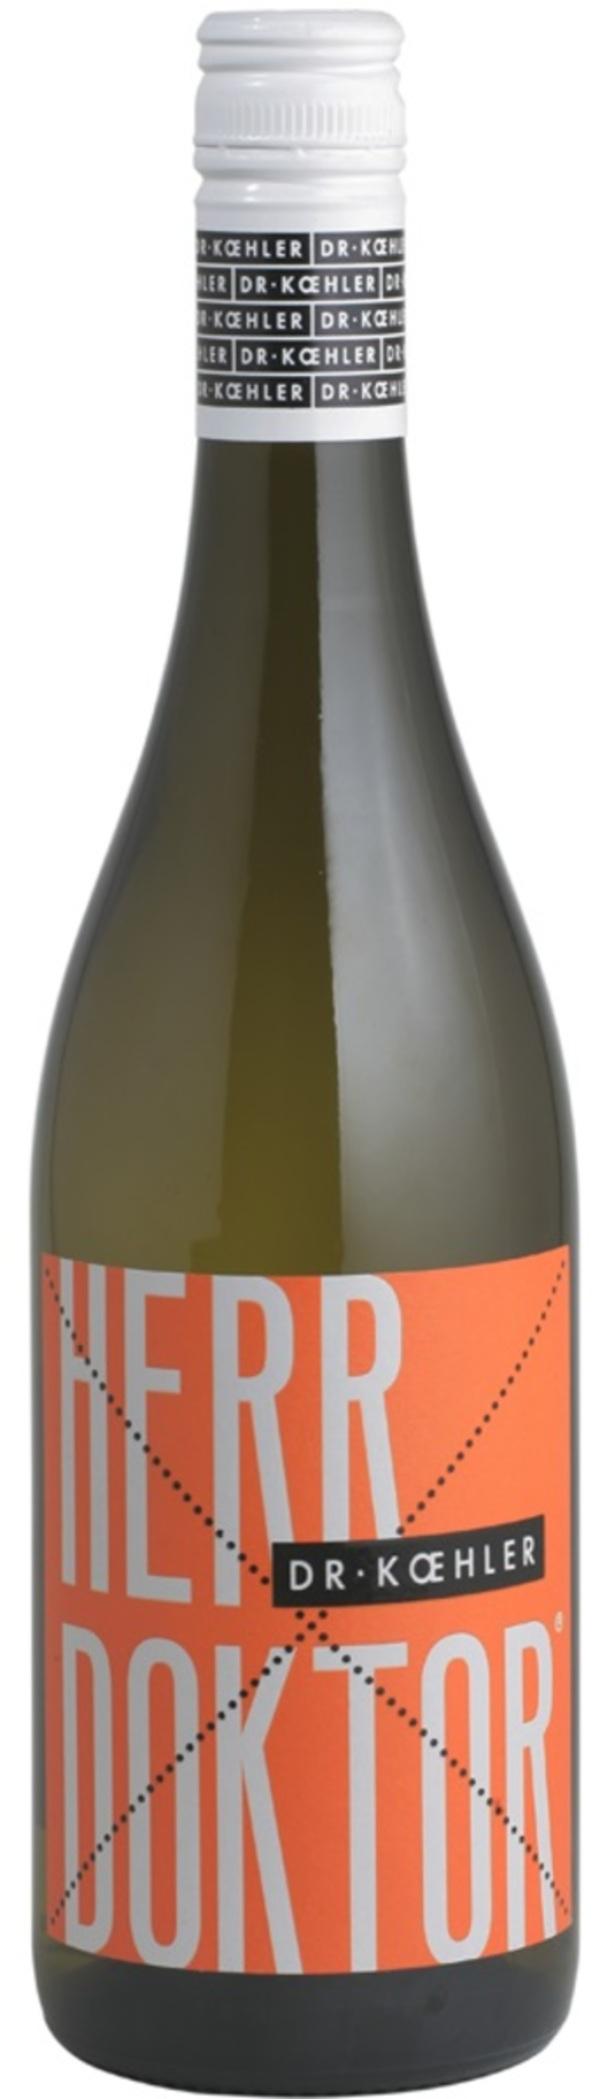 Dr. Koehler Herr Doktor Qualitätswein 2018 0,75 ltr